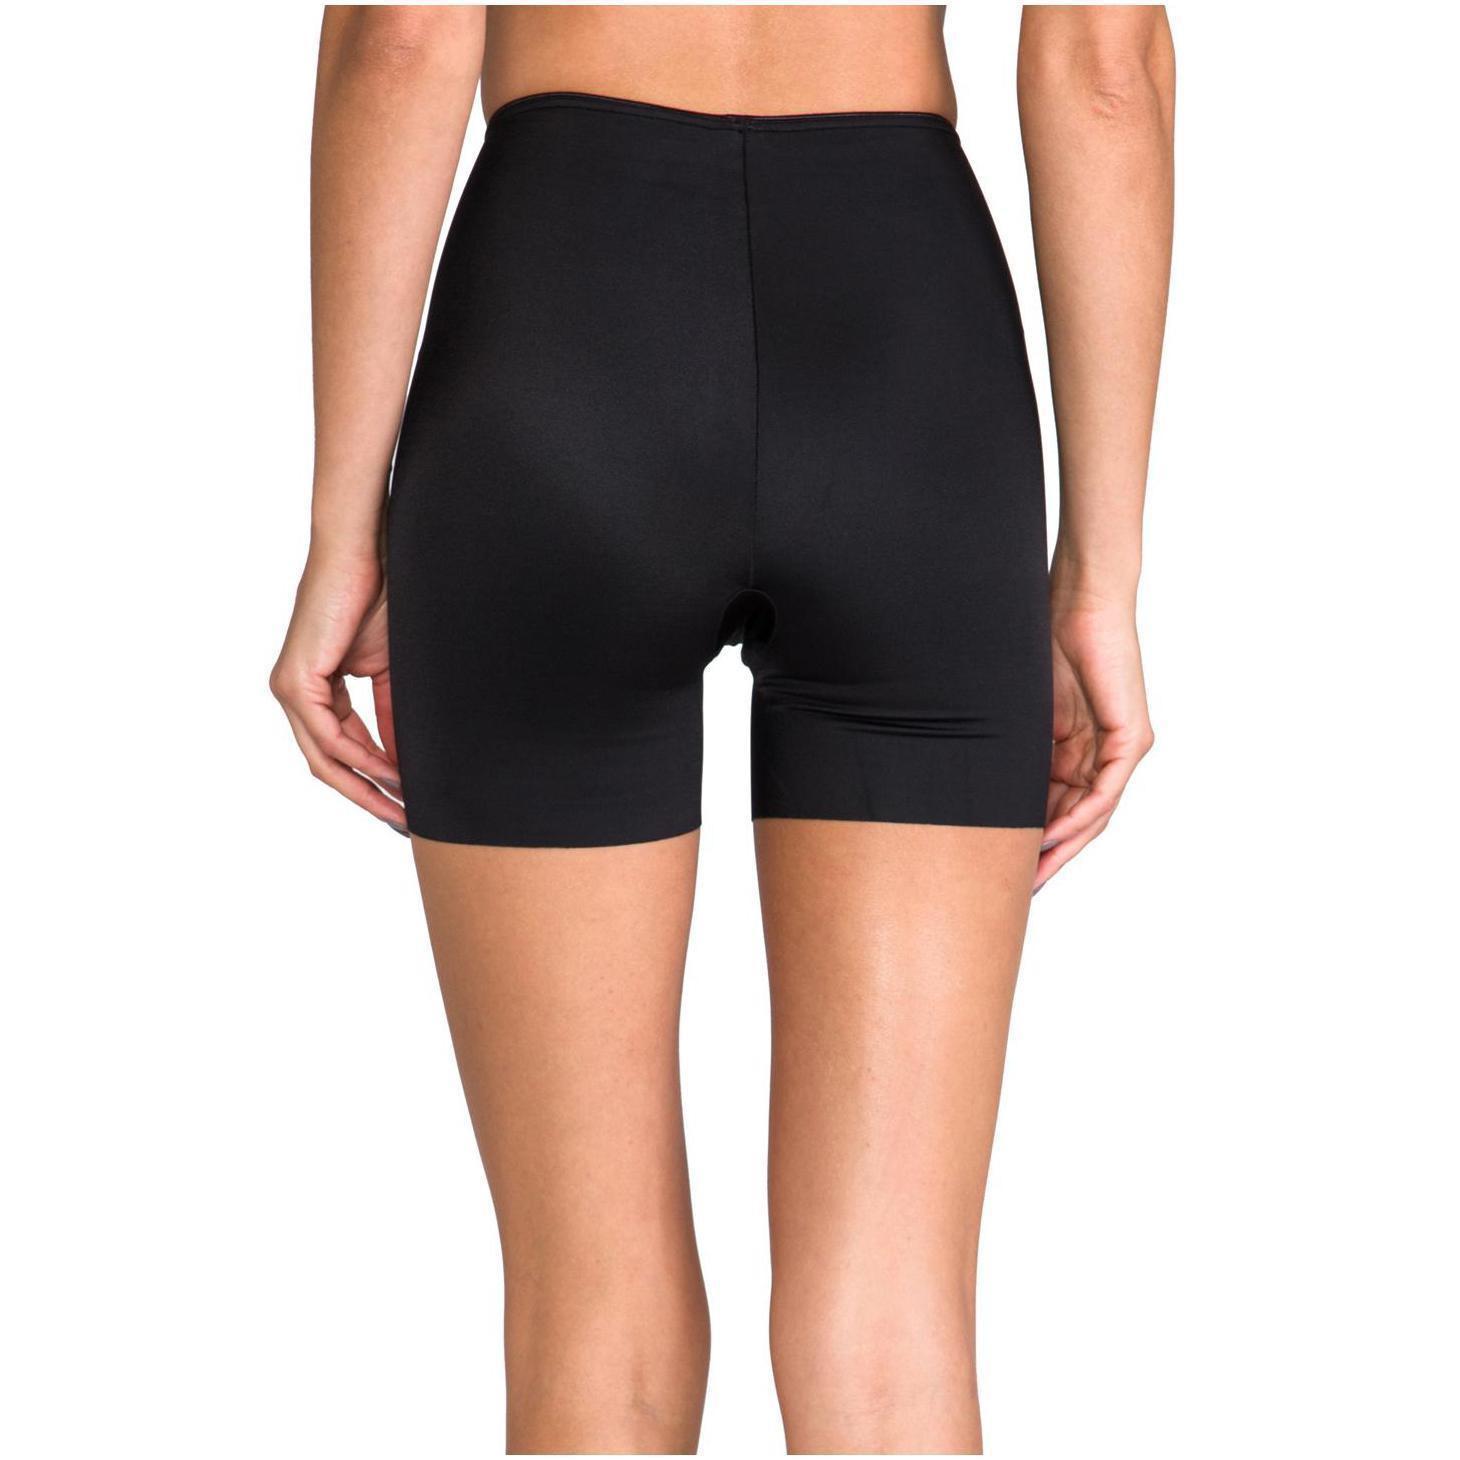 2c94fb17a95b7 Spanx. Women s Black Slimplicity Girl Short Compression Control Shapewear  Boyshorts 393 393p